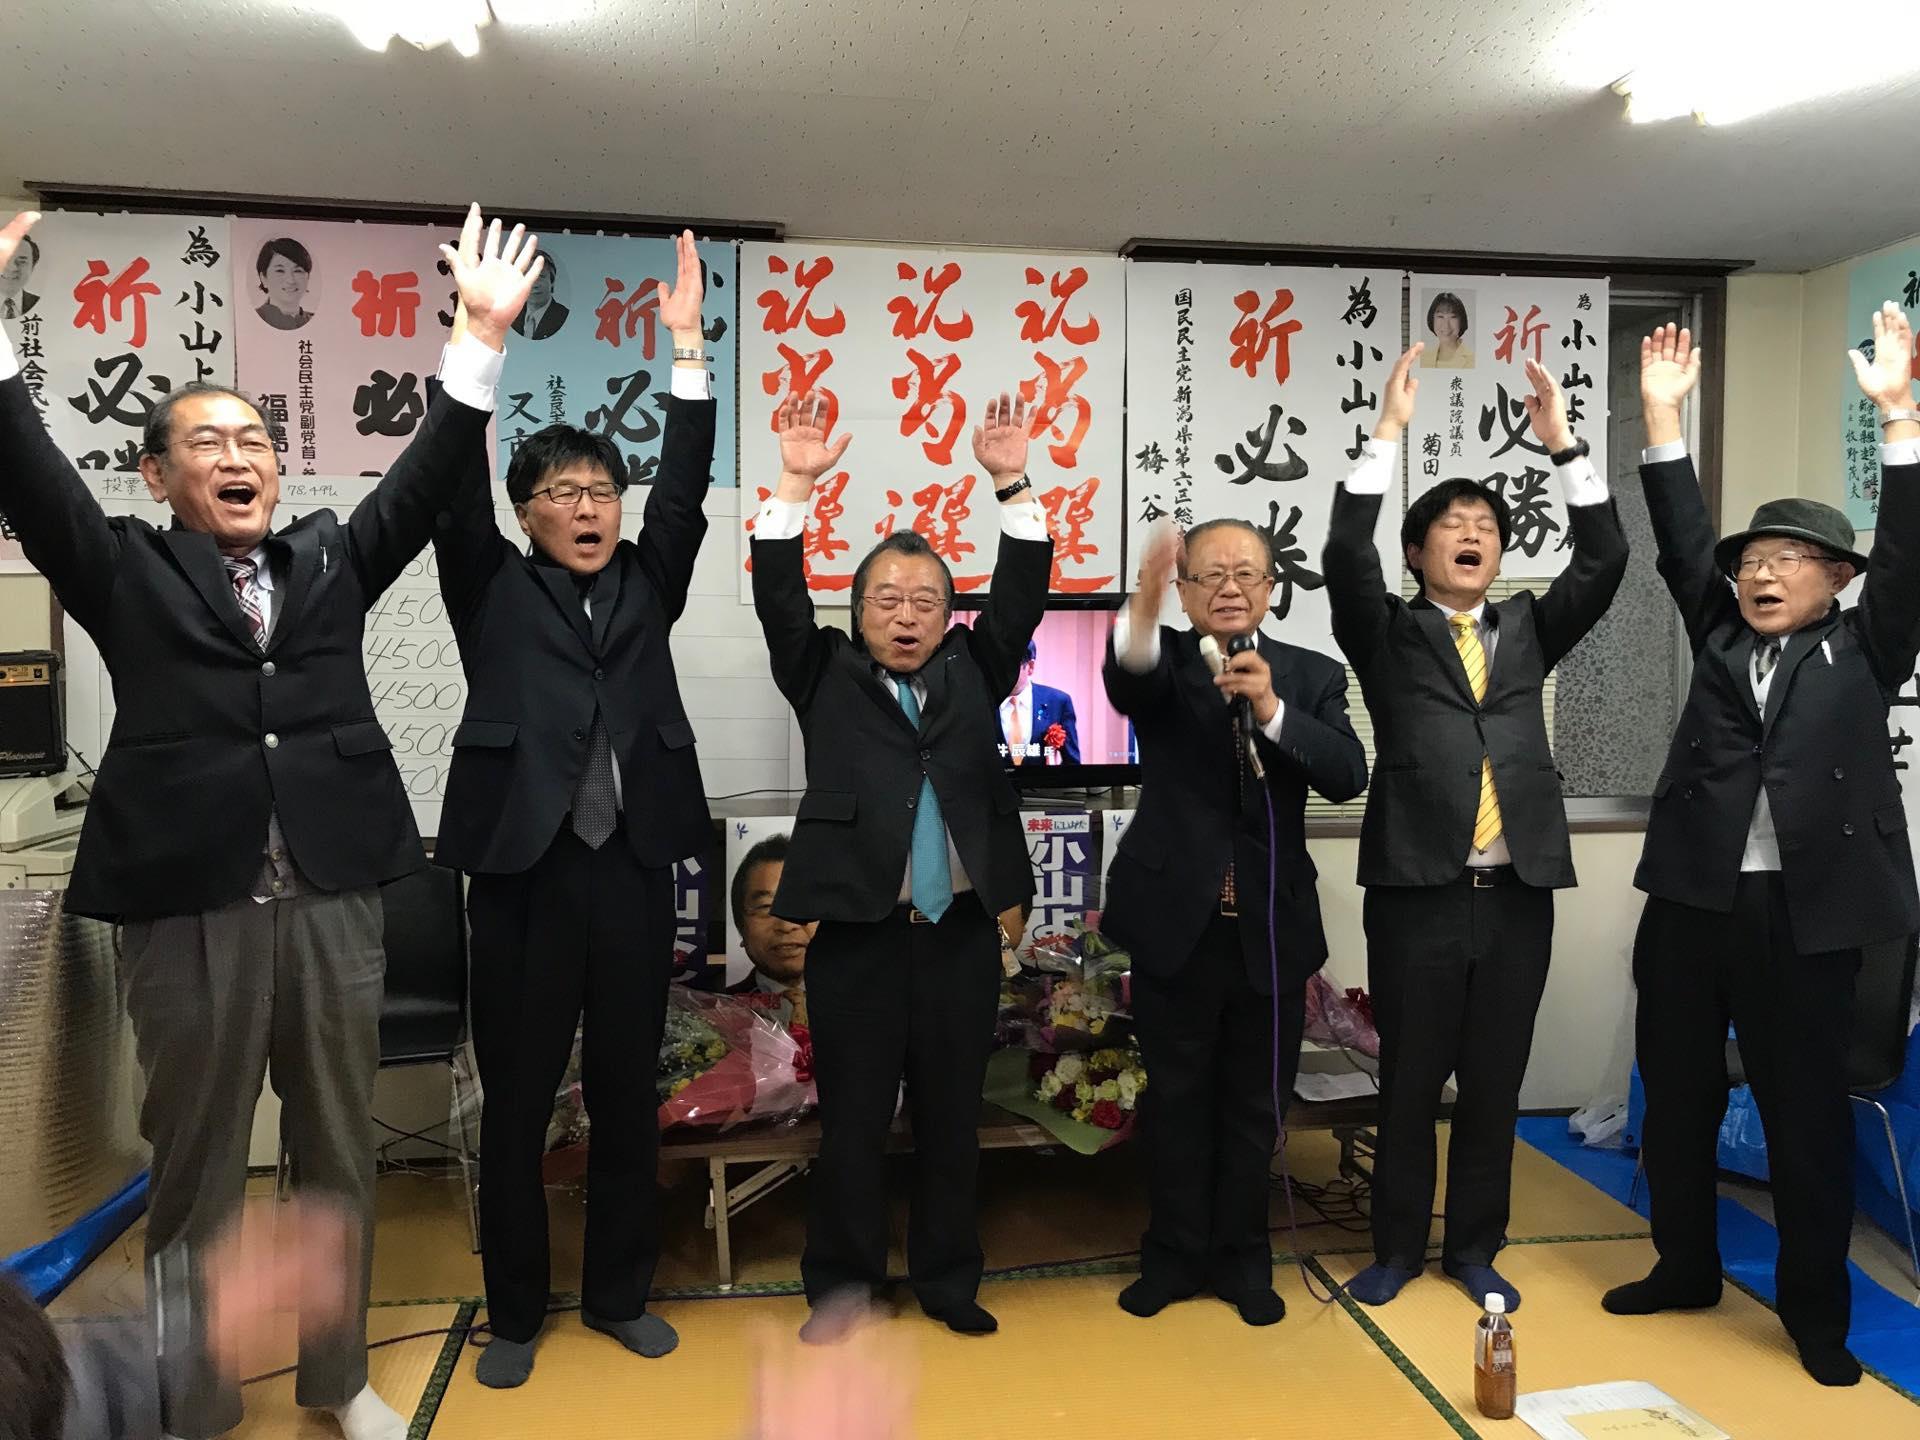 【2019年県議選 当選 】-1